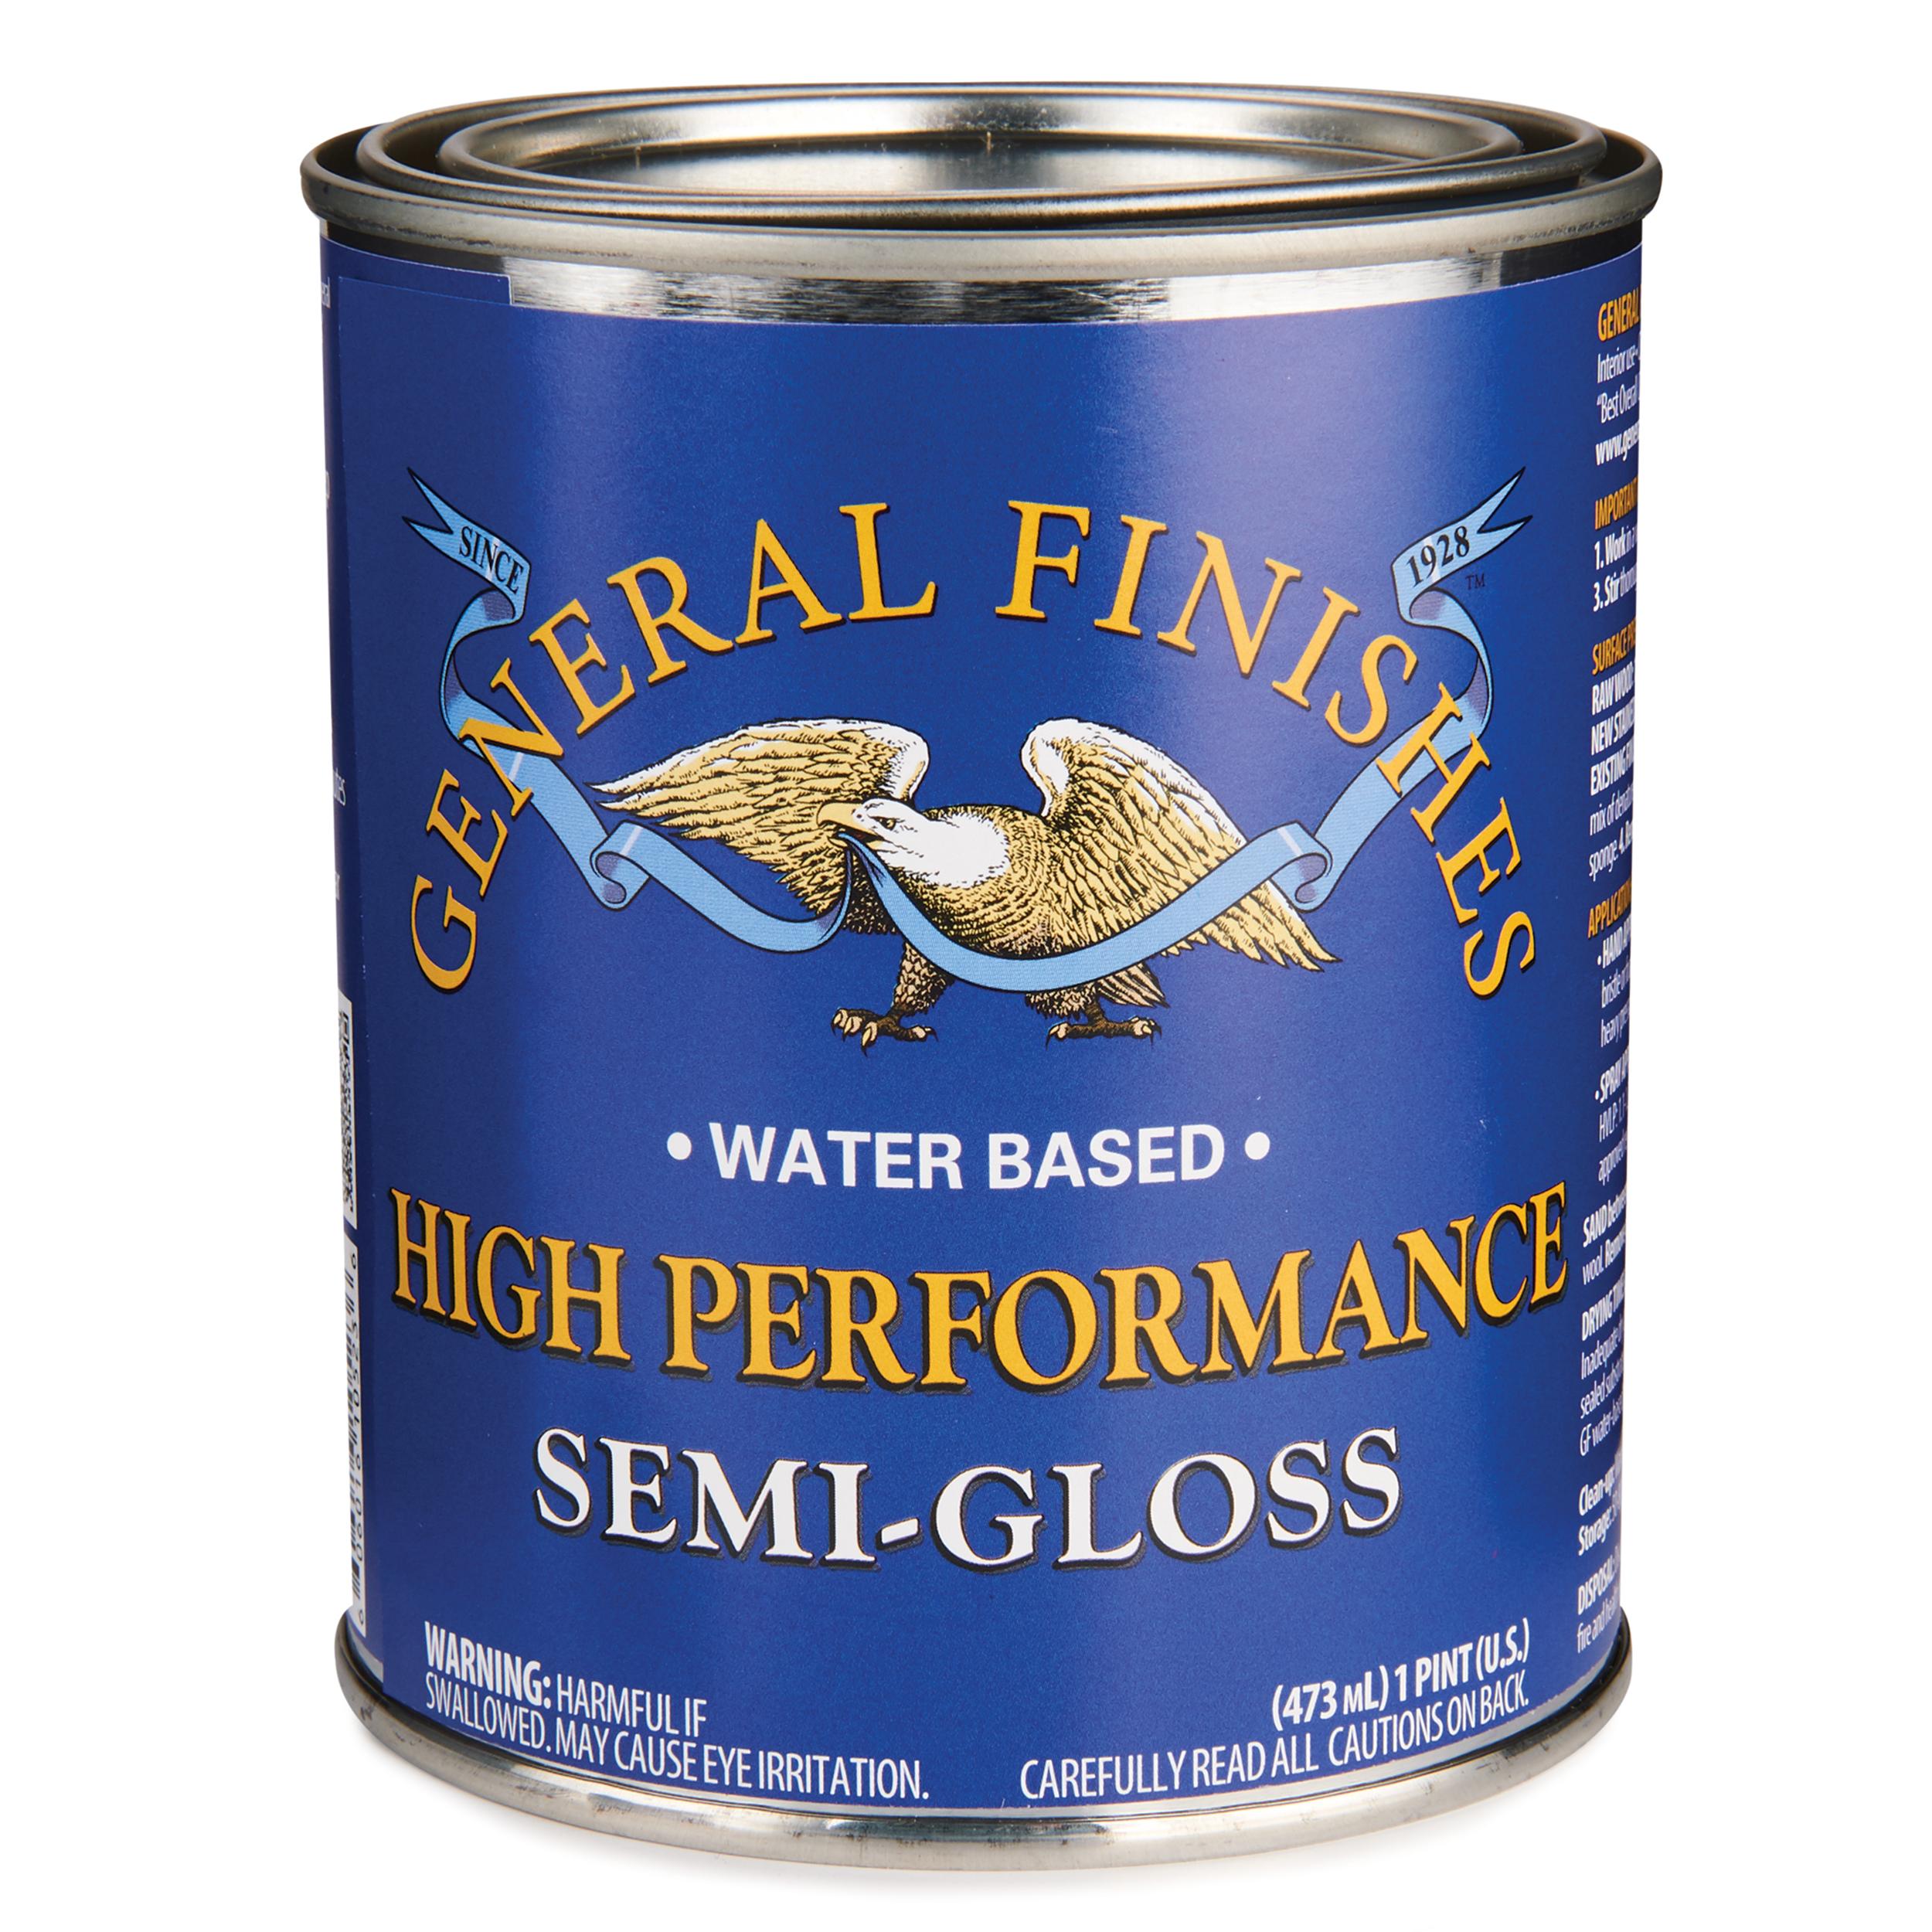 Semi-Gloss High Performance Varnish Water Based Pint